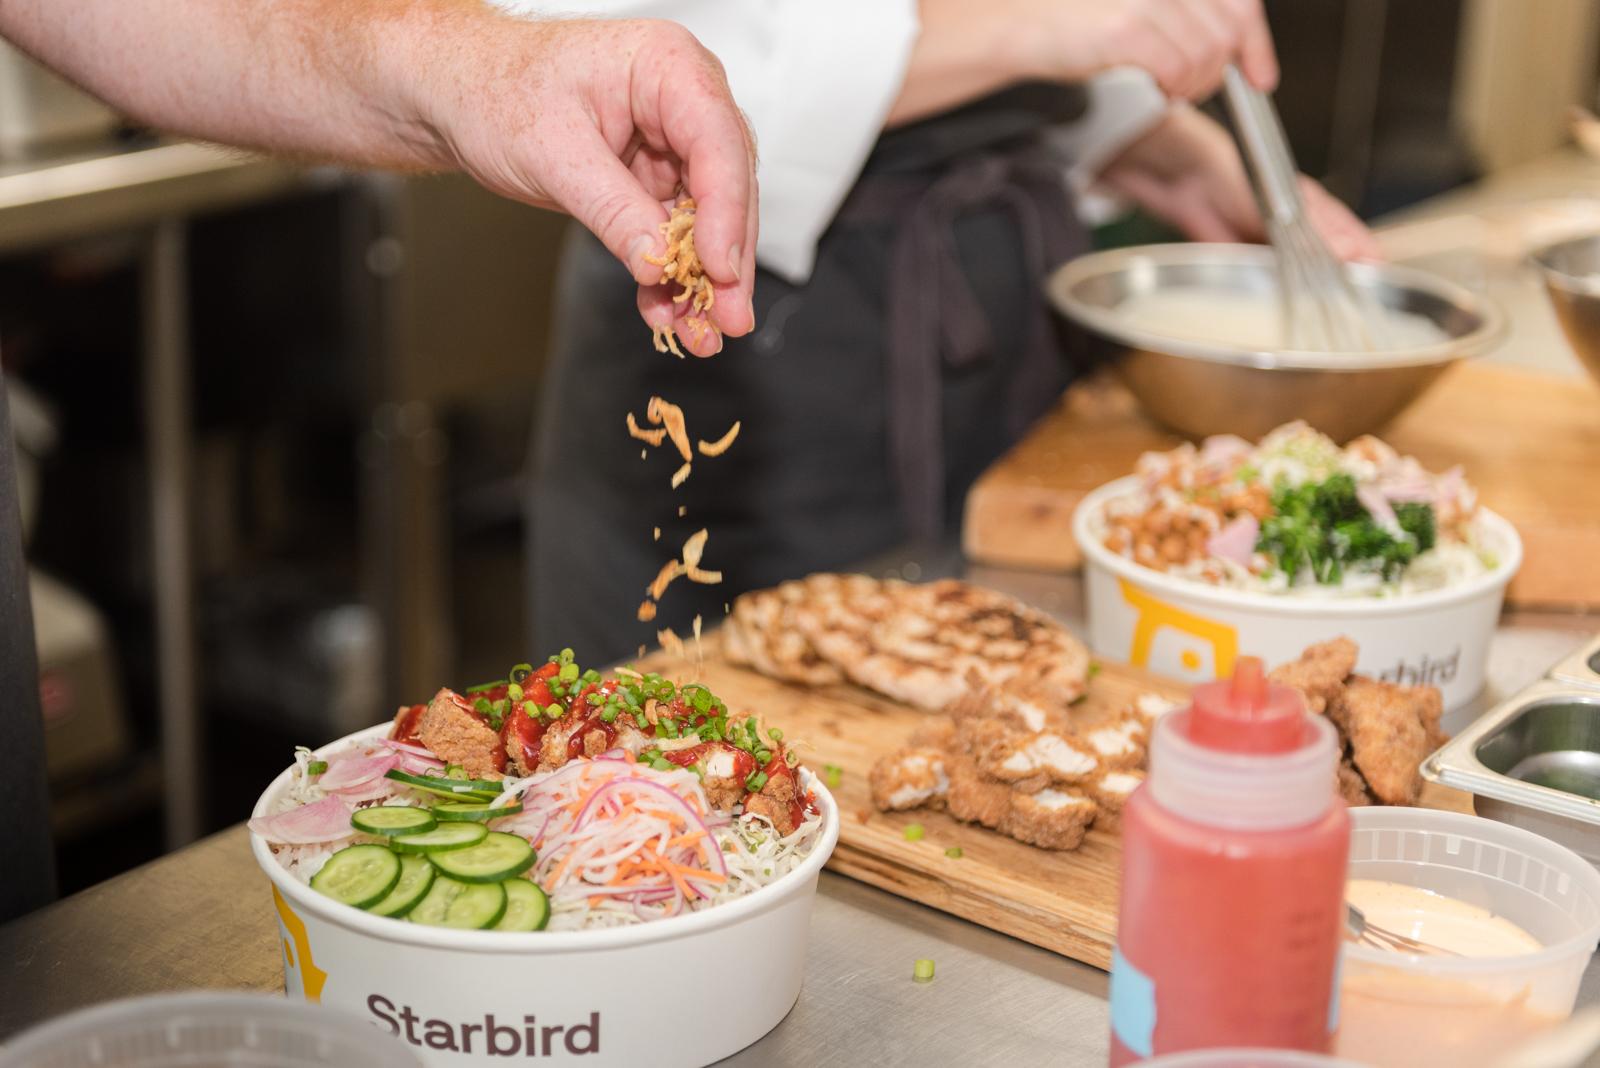 Sprinkling fresh ingredients in a Starbird Bowls